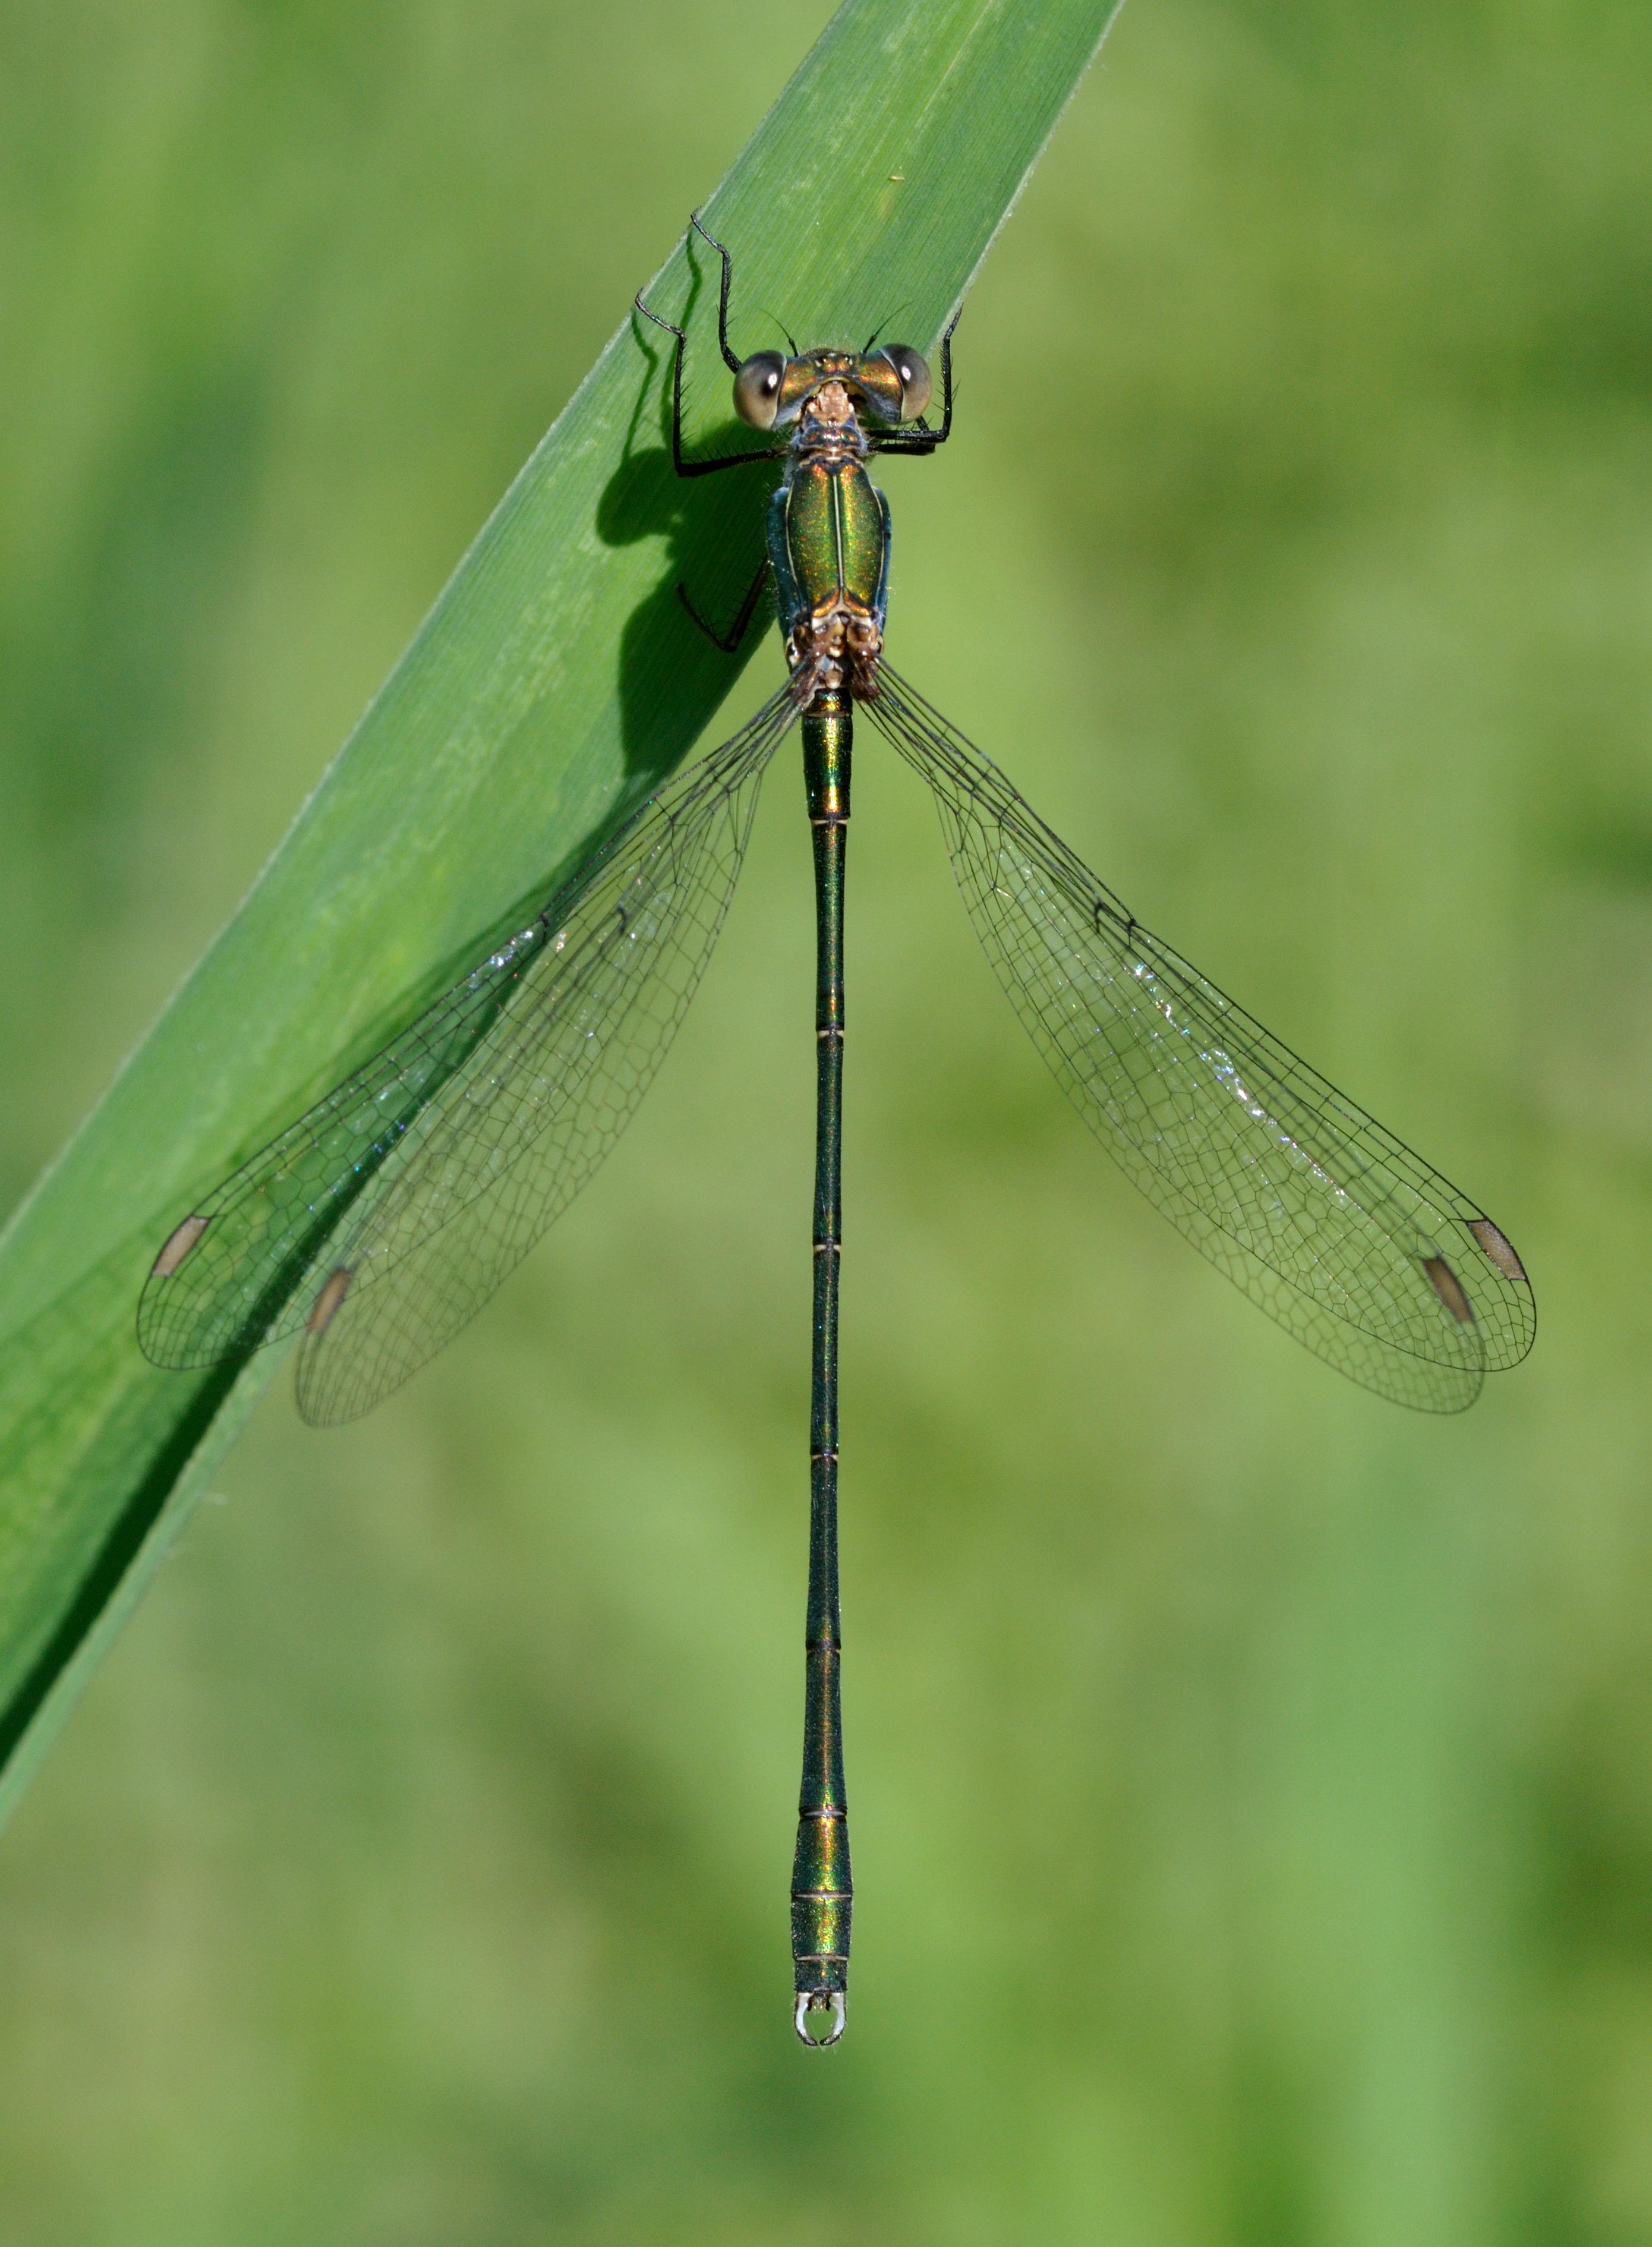 File:Chalcolestes viridis qtl2.jpg - Wikimedia Commons